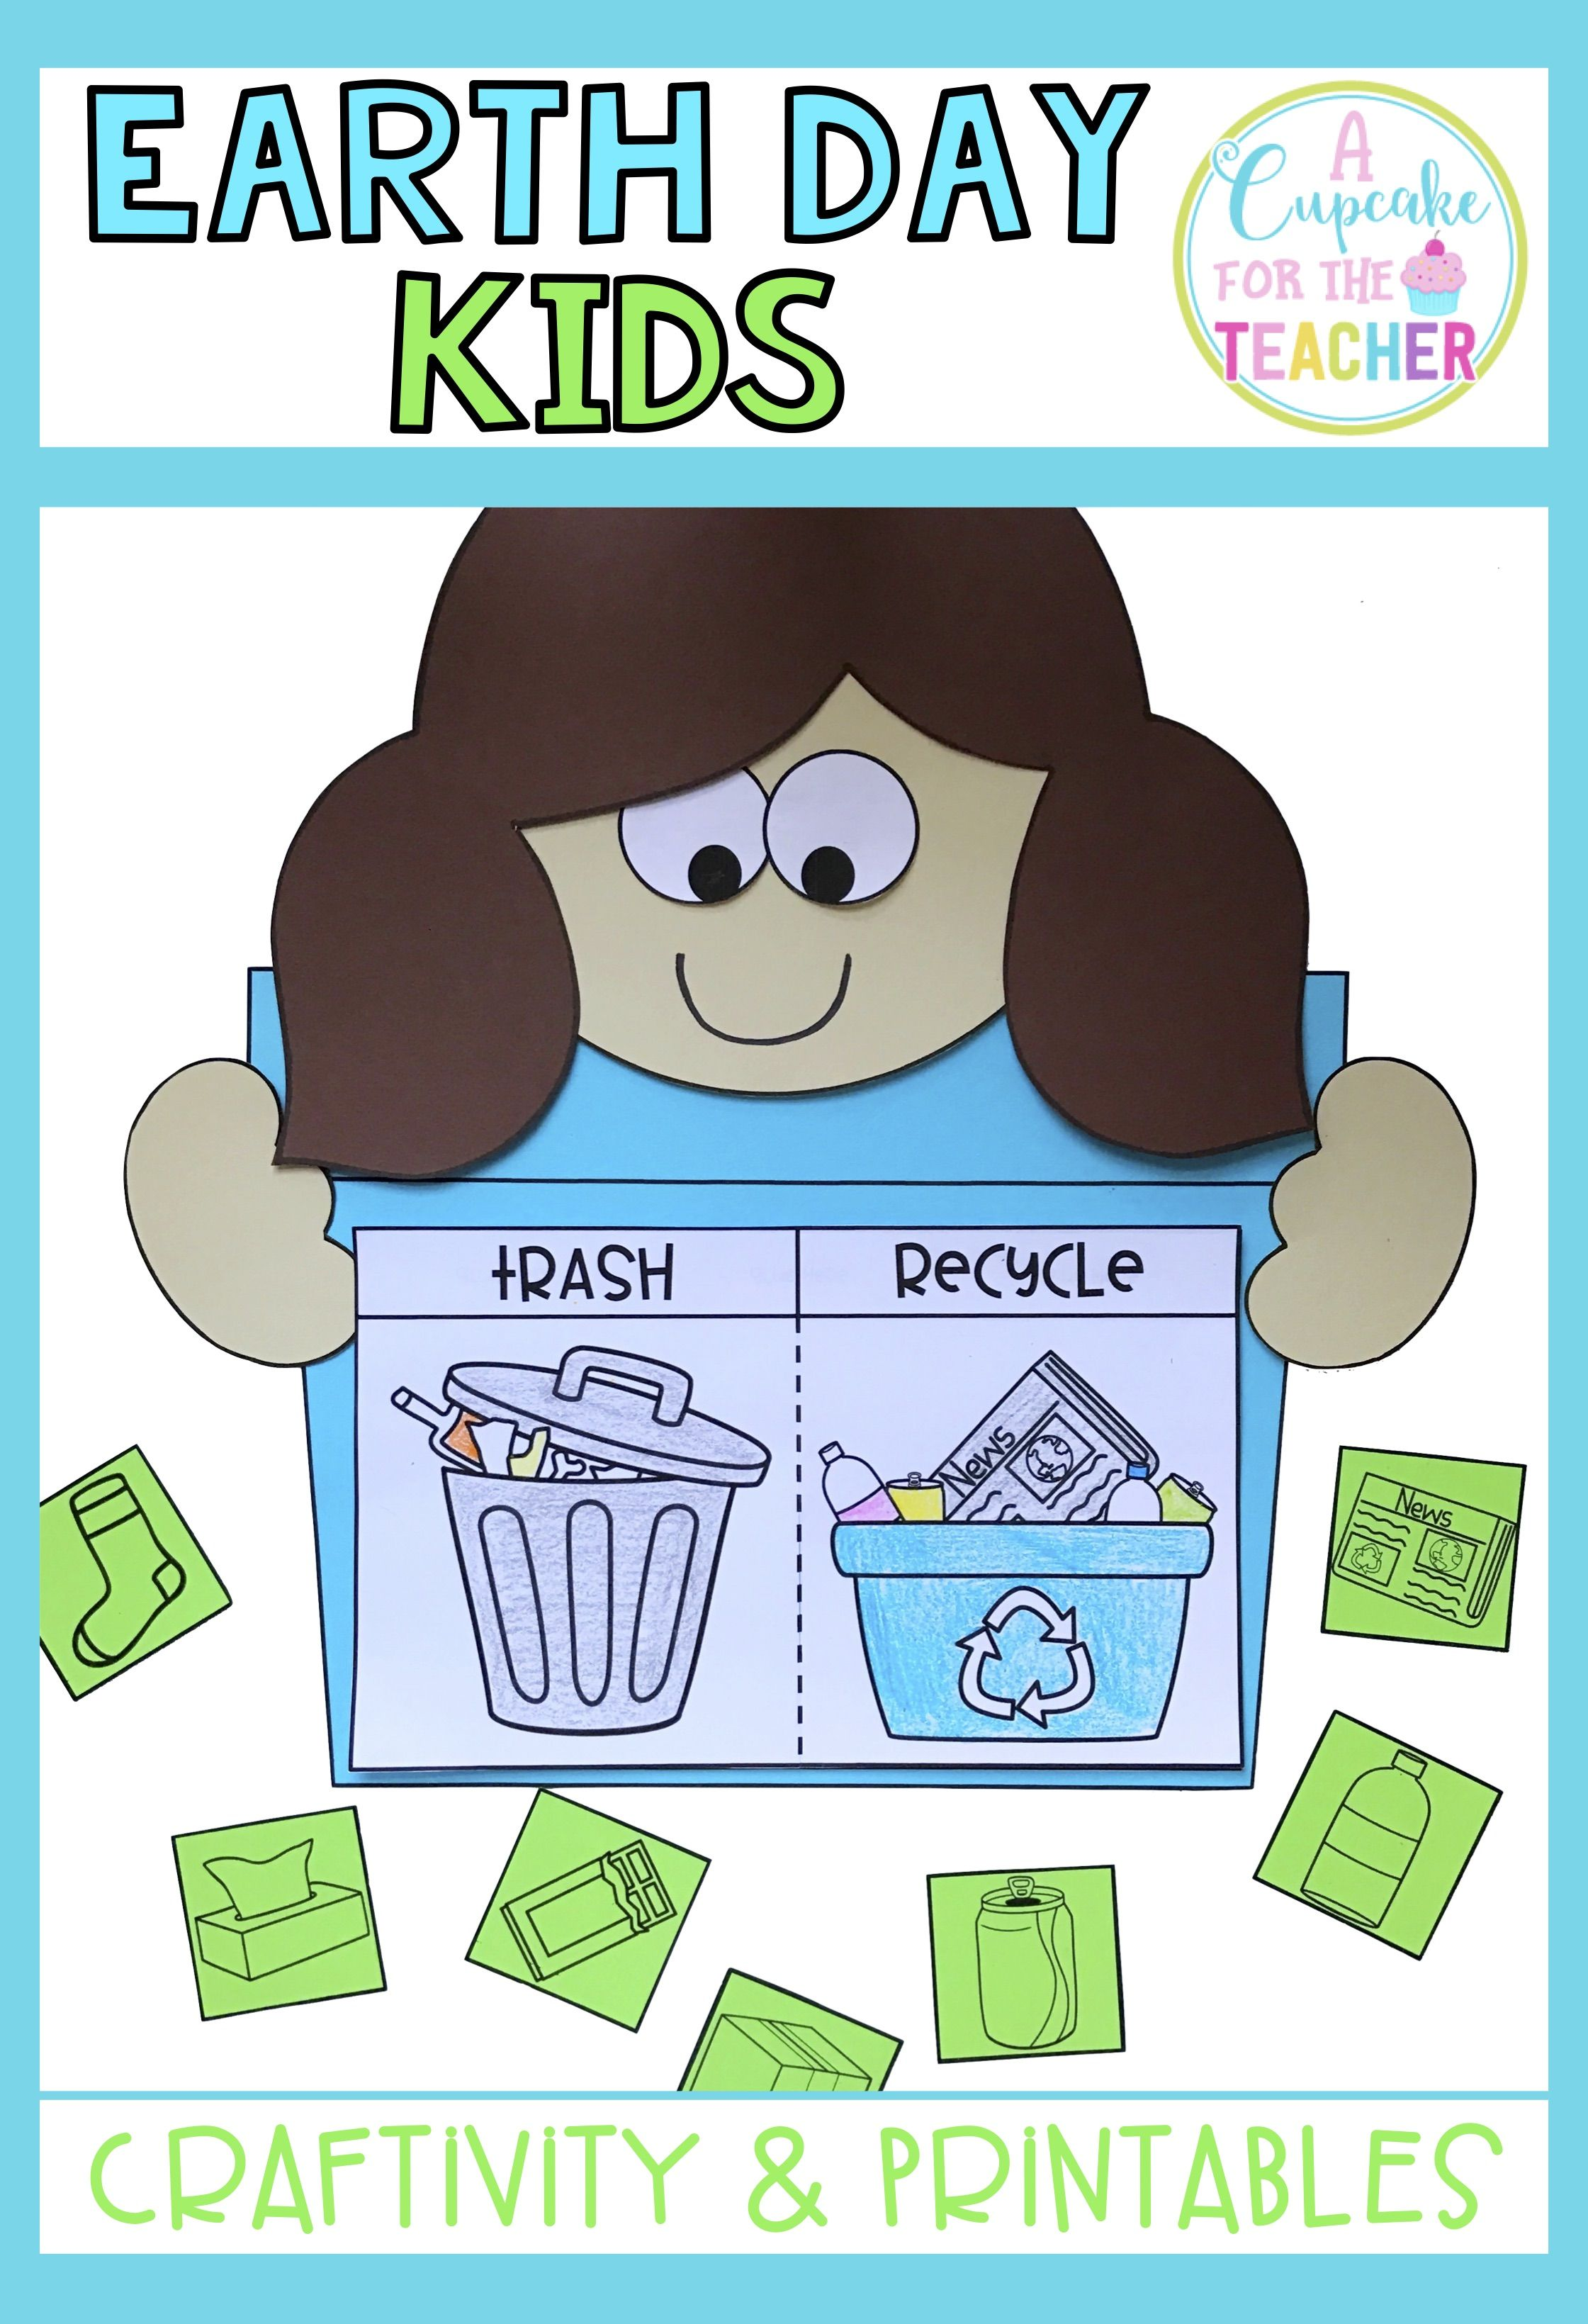 Earth Day Kids {Craftivity & Printables}